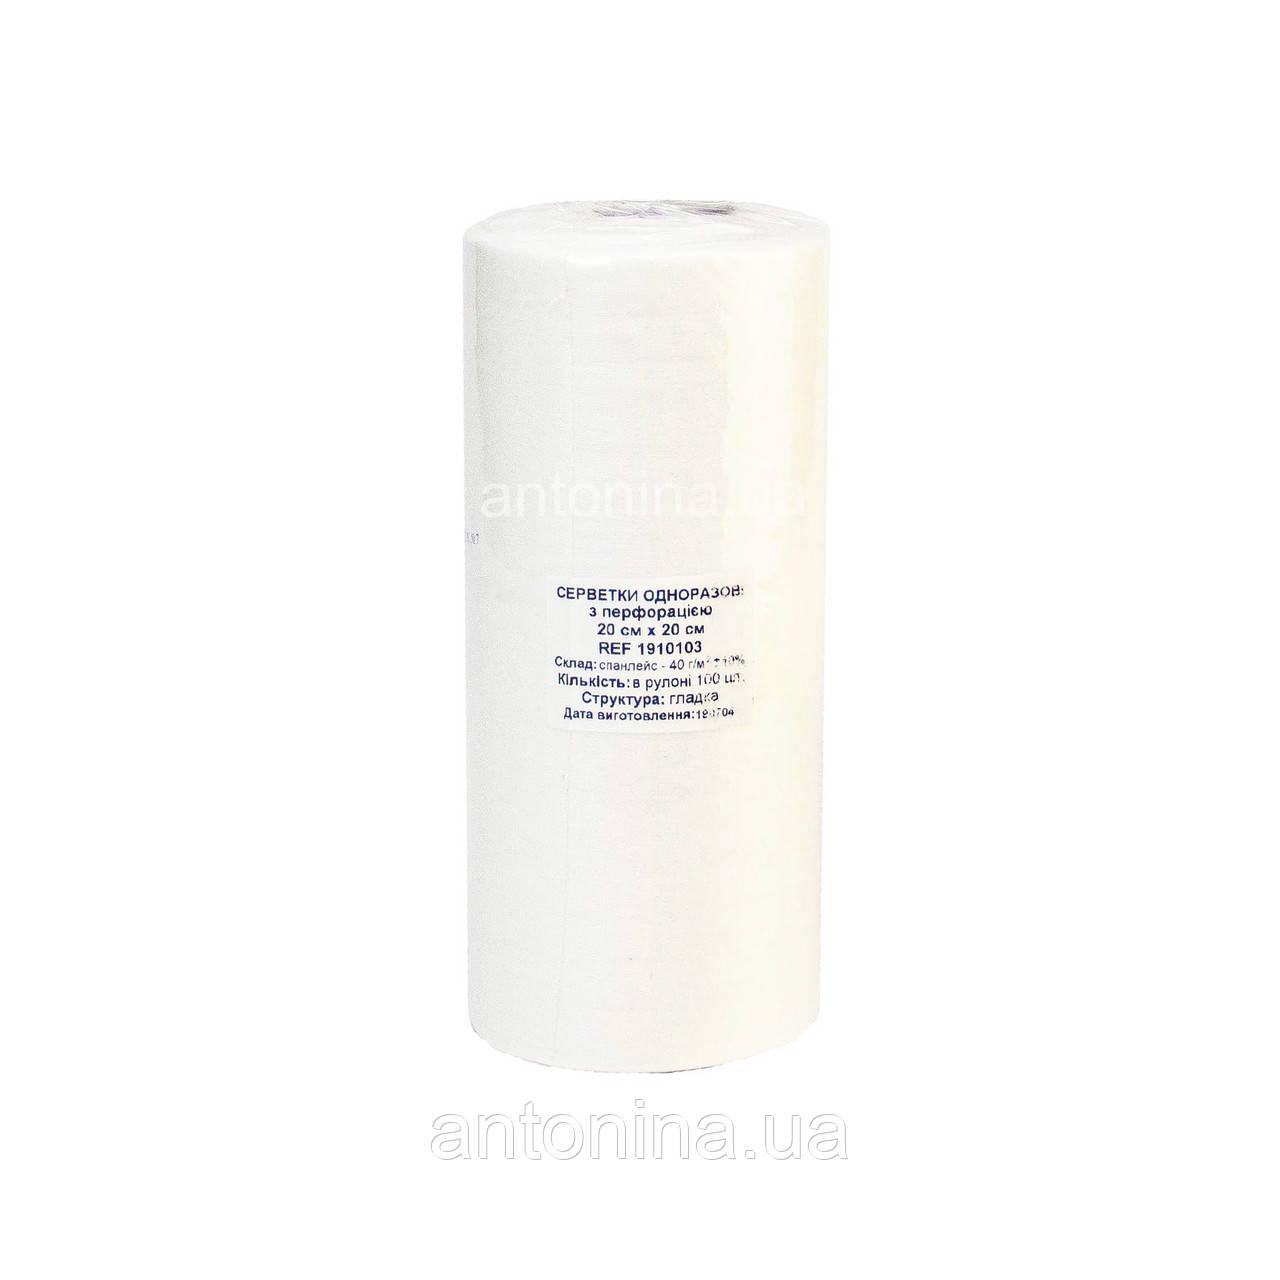 Салфетка 20х20 см (100 шт/рул), спанлейс-гладкий рулон с перфорацией